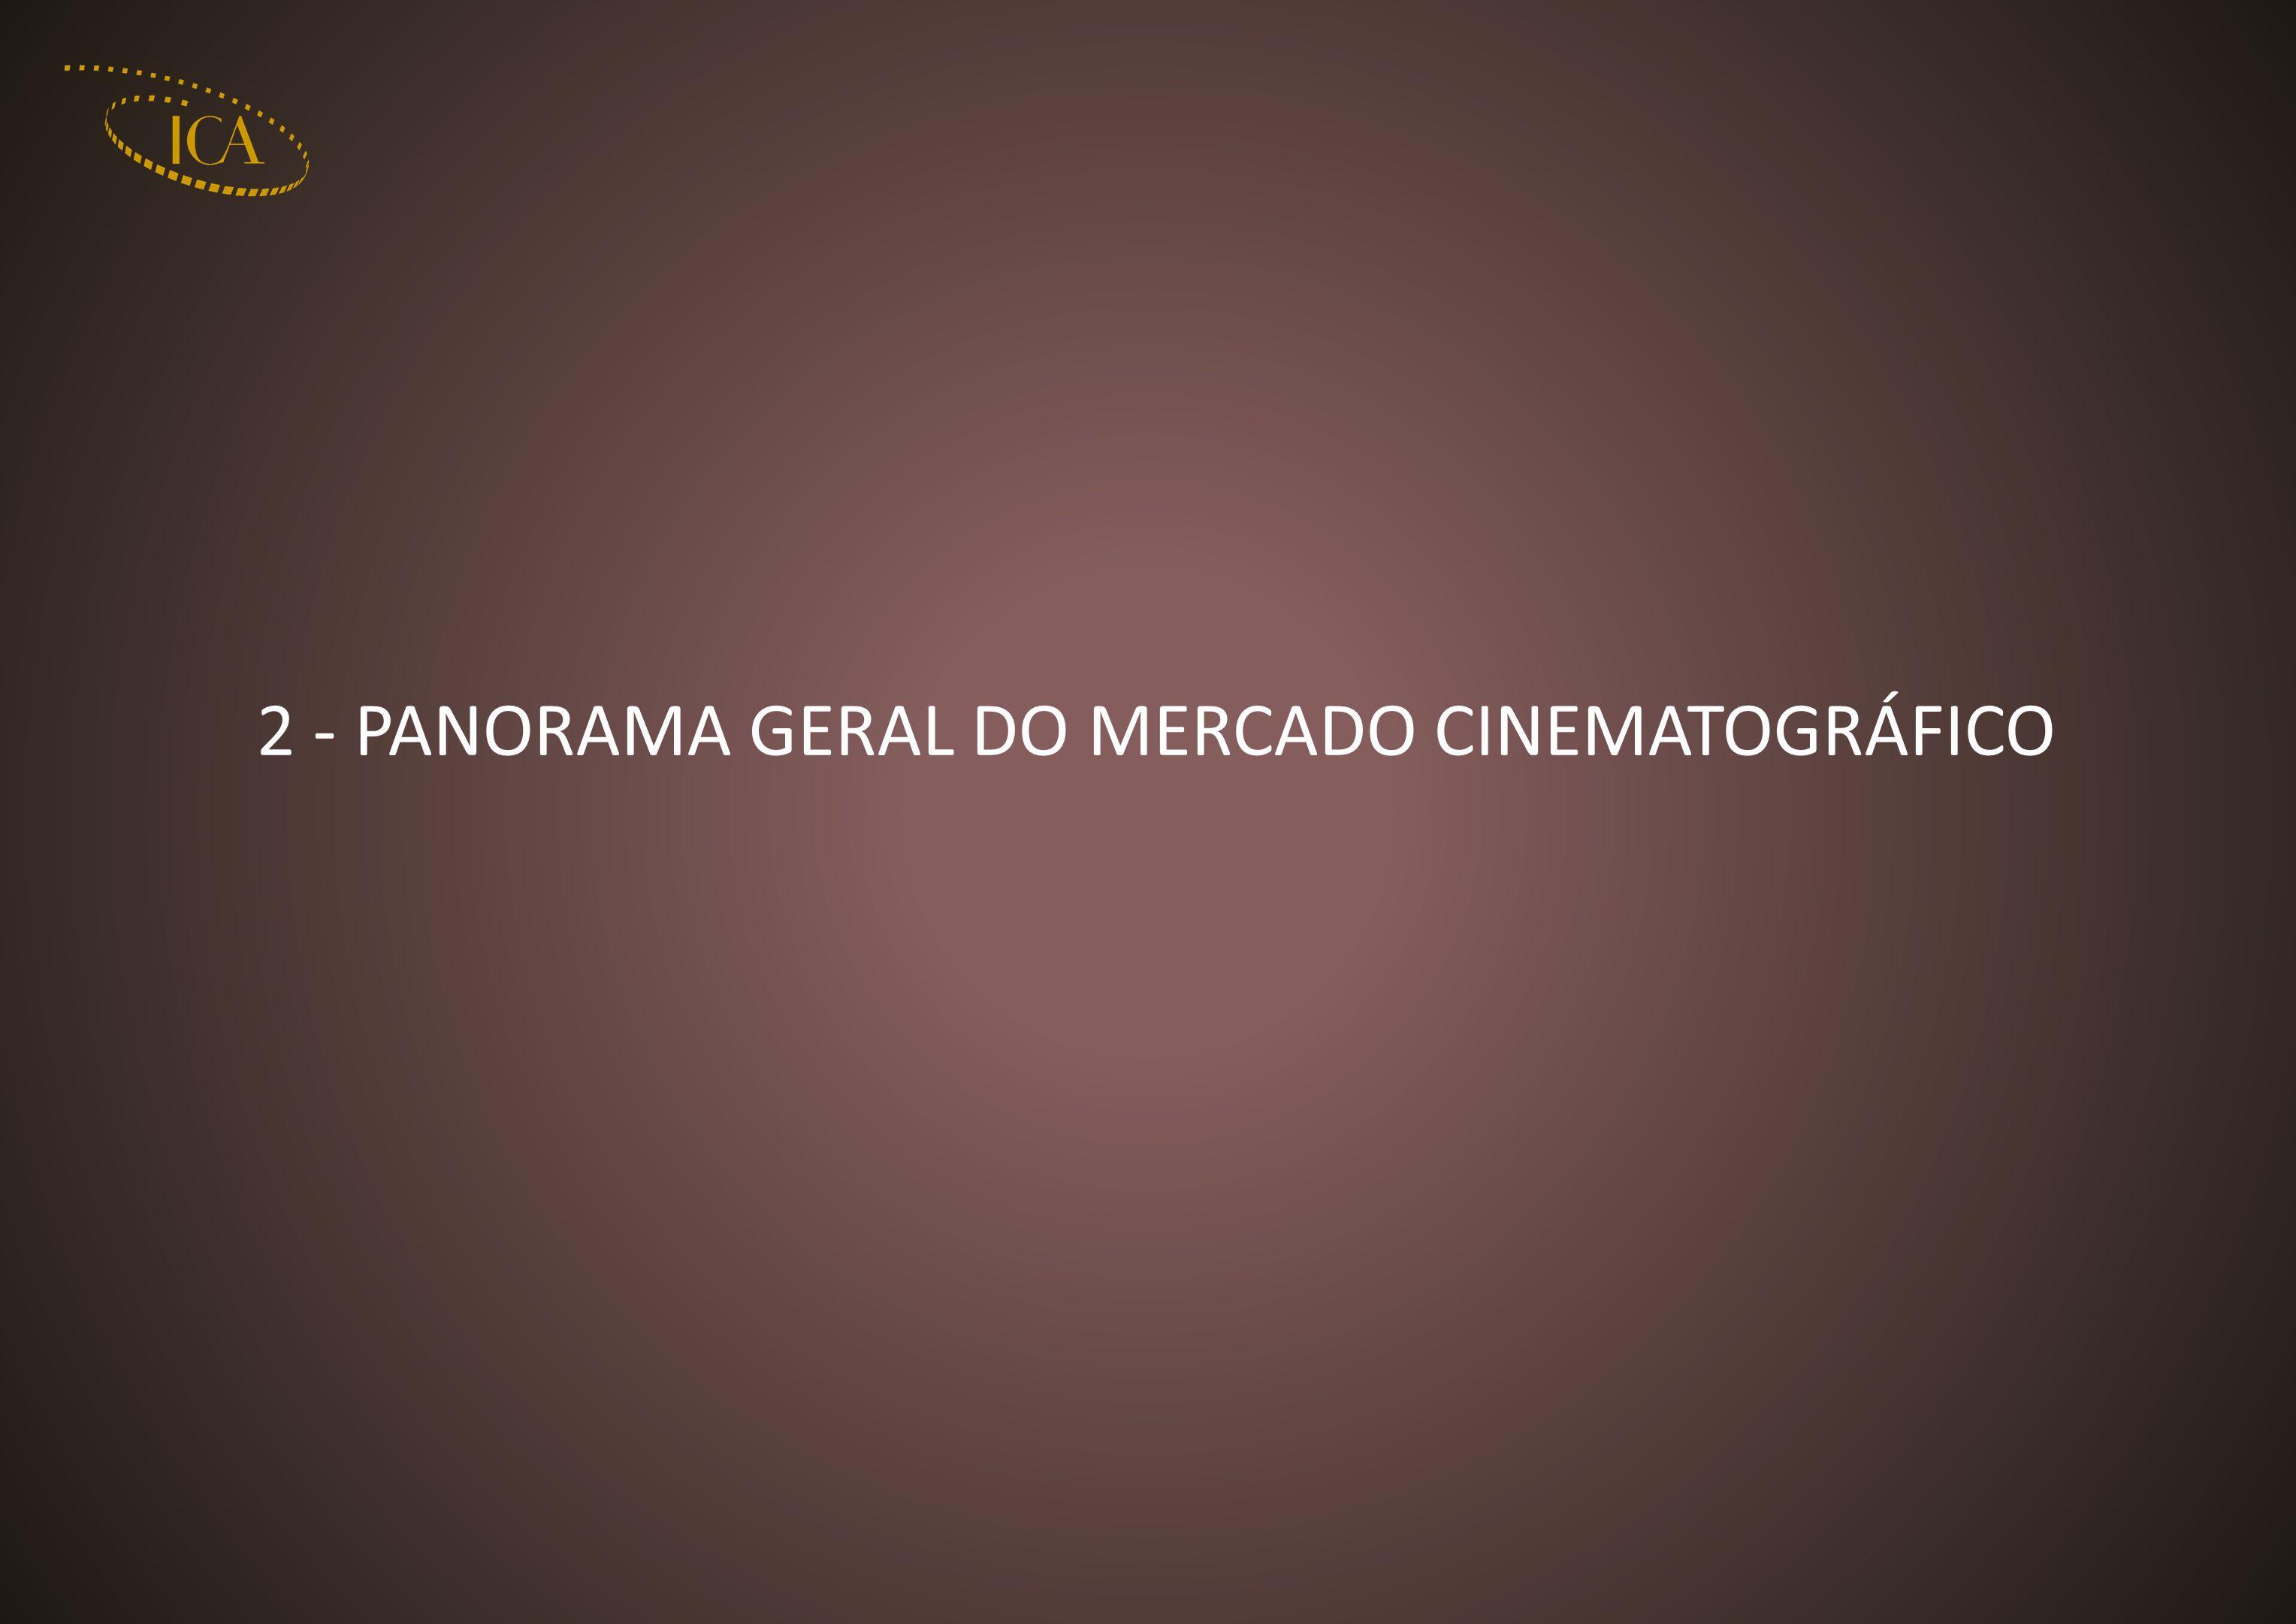 2 - PANORAMA GERAL DO MERCADO CINEMATOGRÁFICO